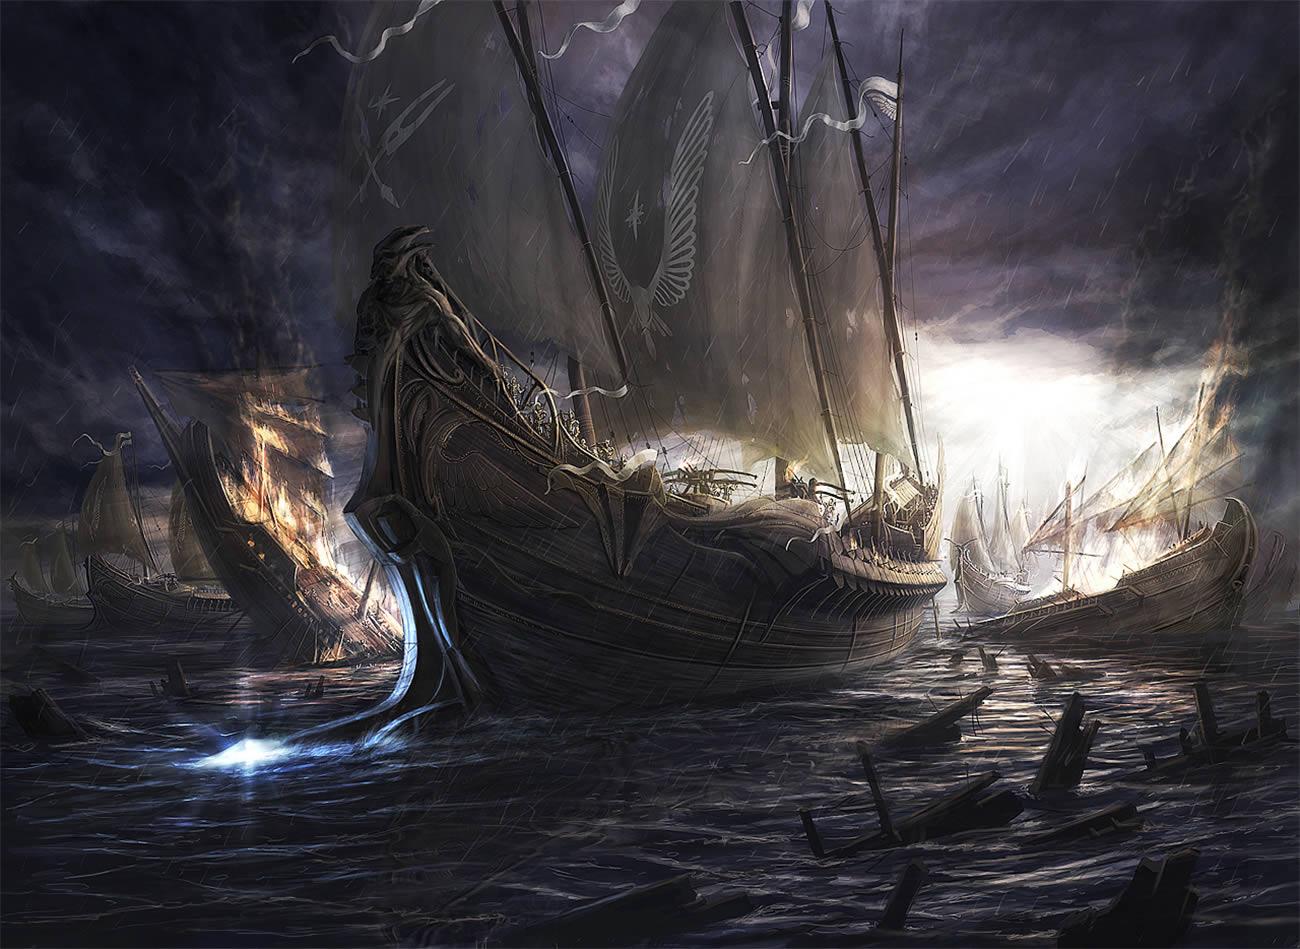 battle ships, digital art by rado javor 2